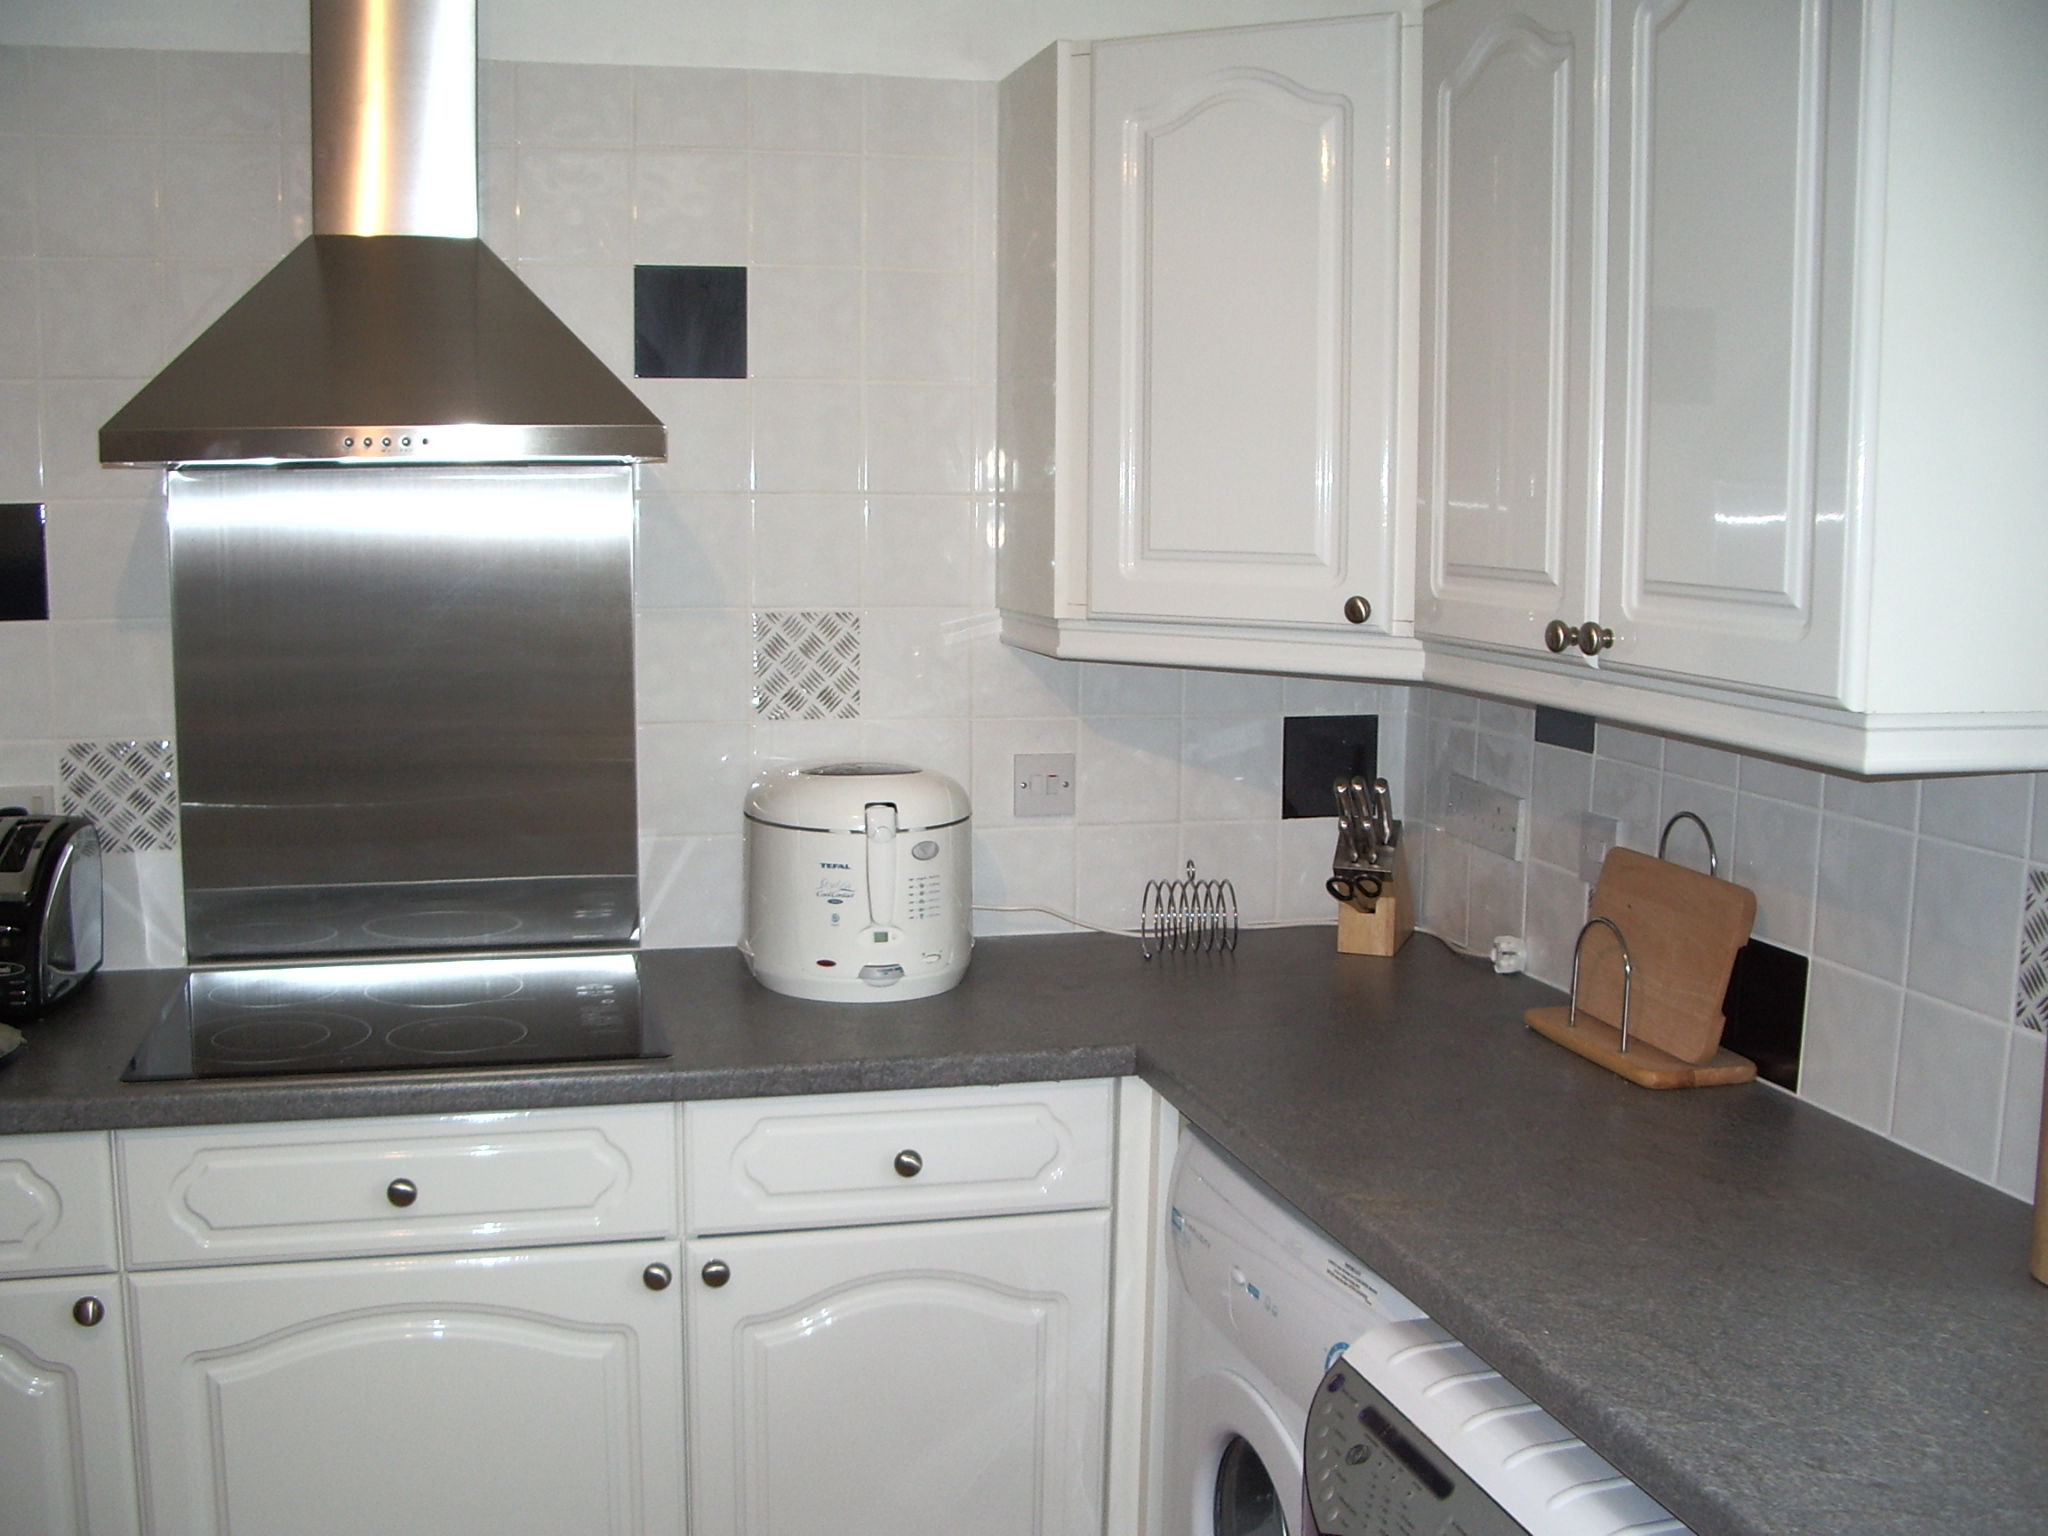 Kitchen Hobs And Chimneys ~ Mike walton property maintenance plumbing kitchen design